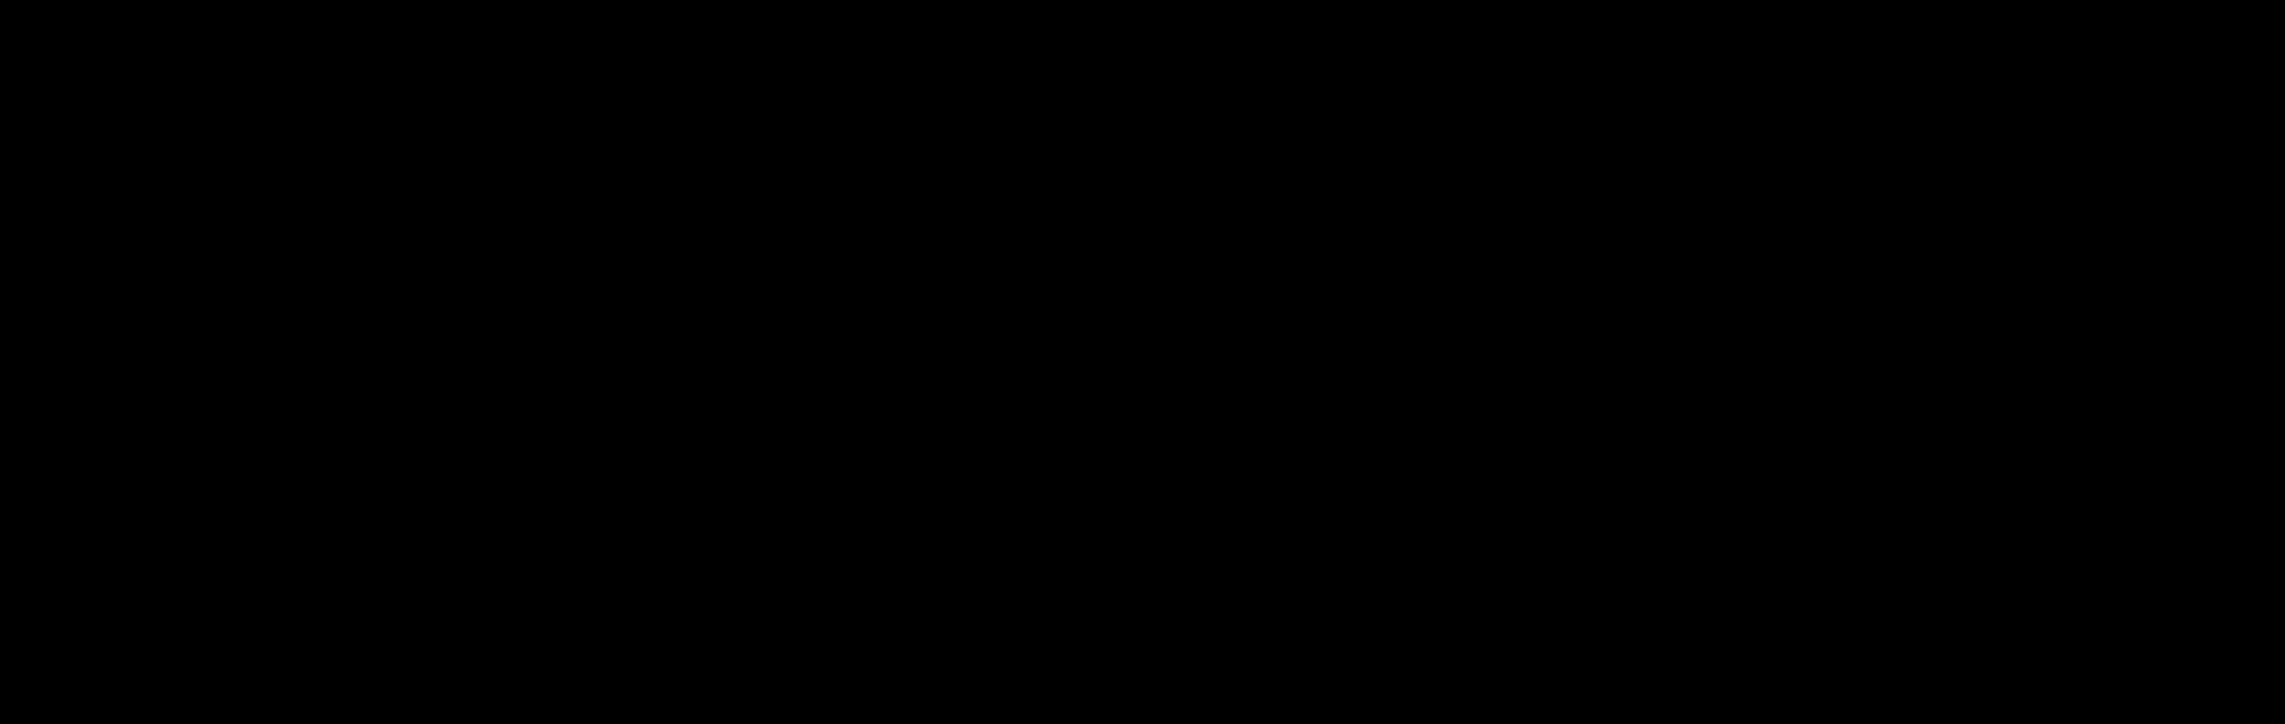 Jet silhouette icons png. Pilot clipart fighter pilot